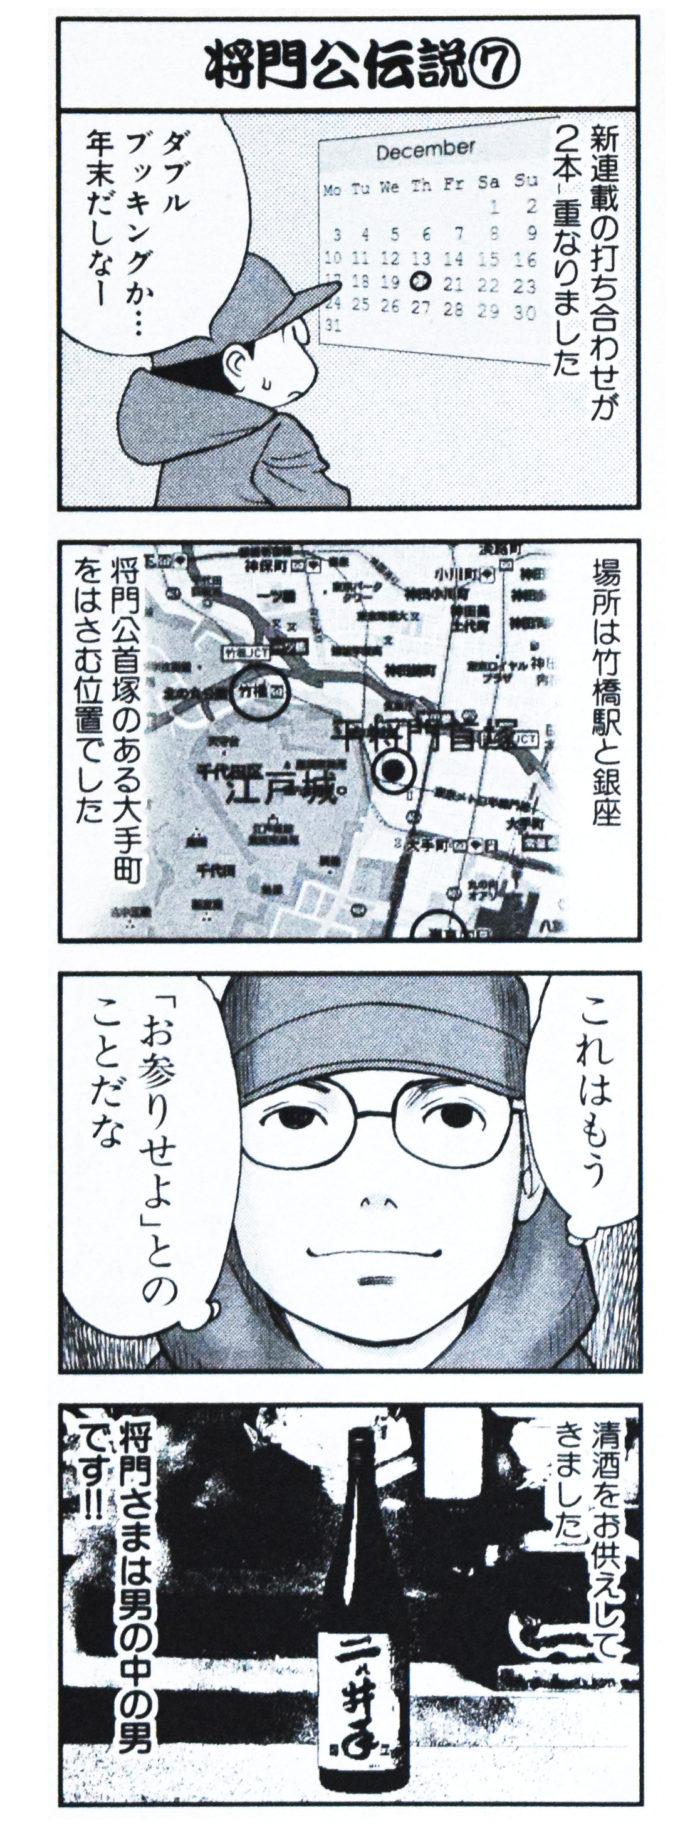 torihada-syoumon03-05